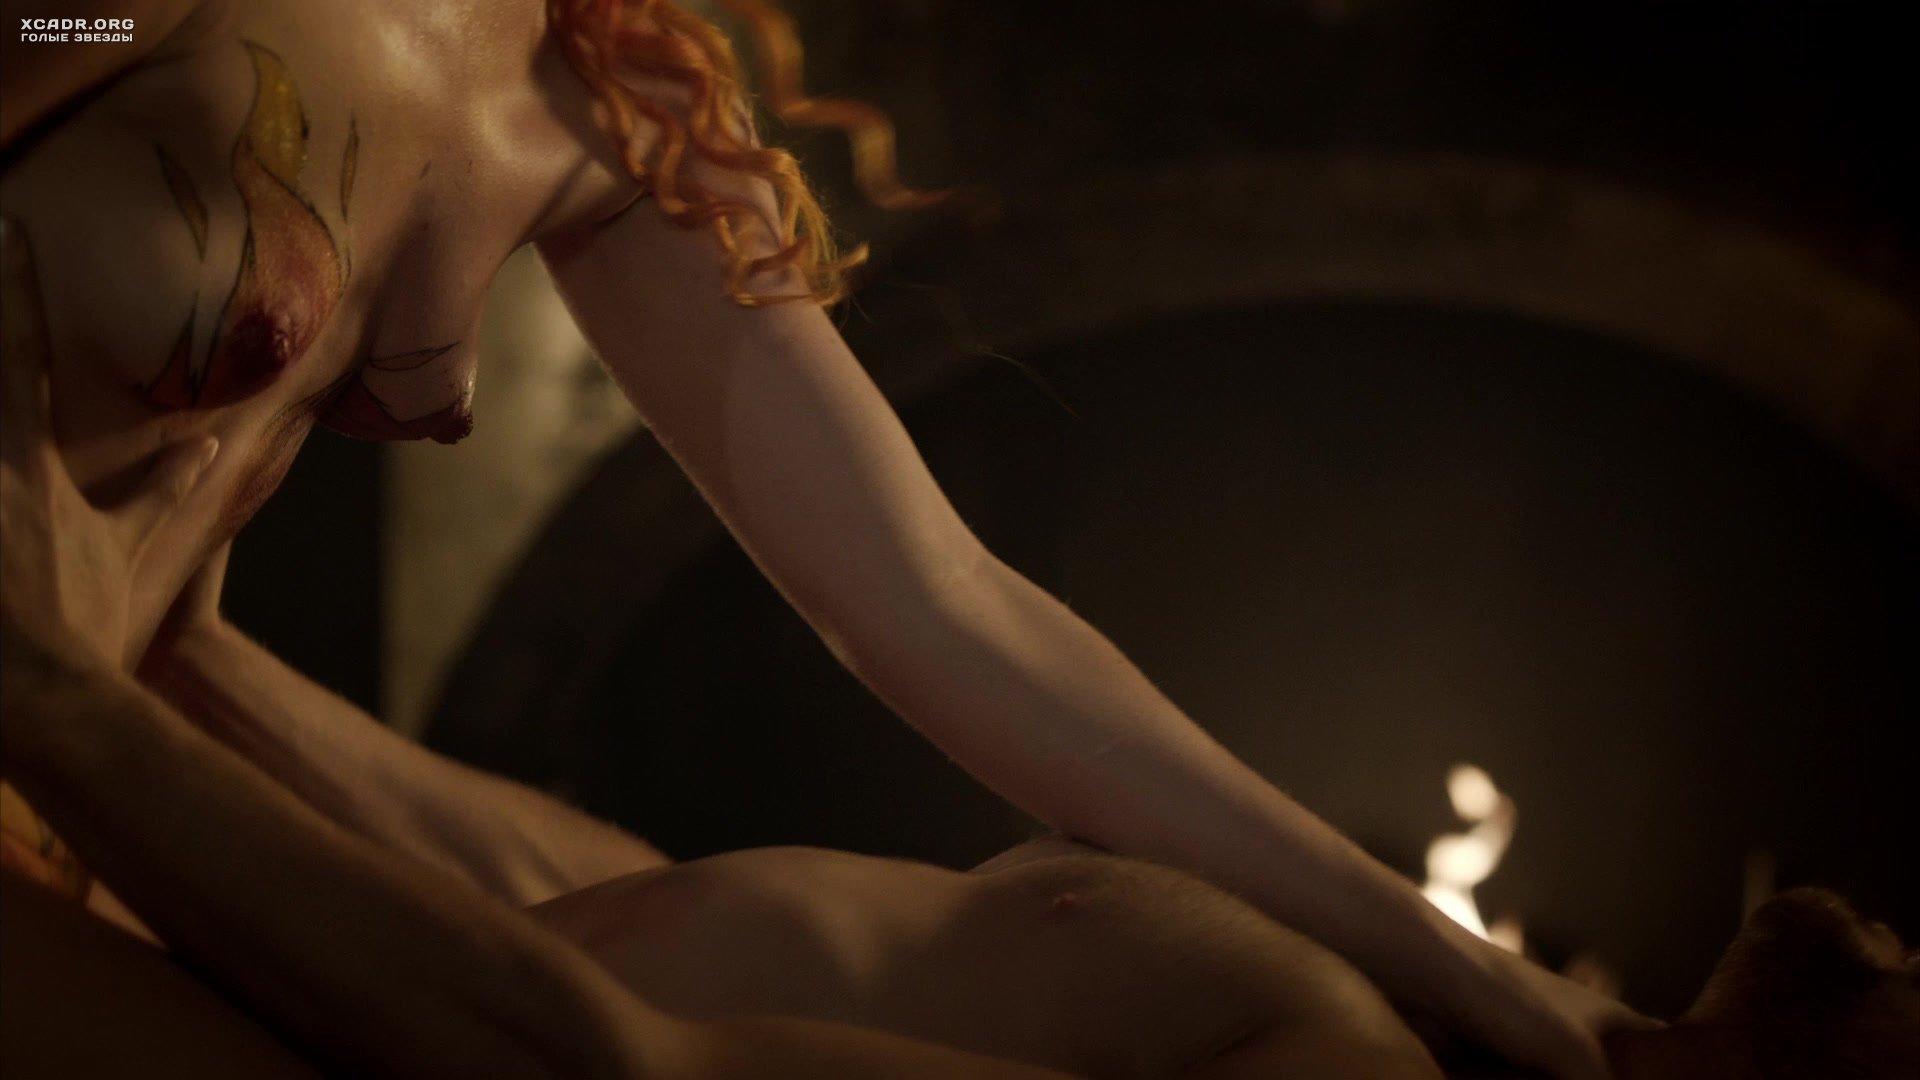 Лаура хэддок голая секс видео фото 680-725